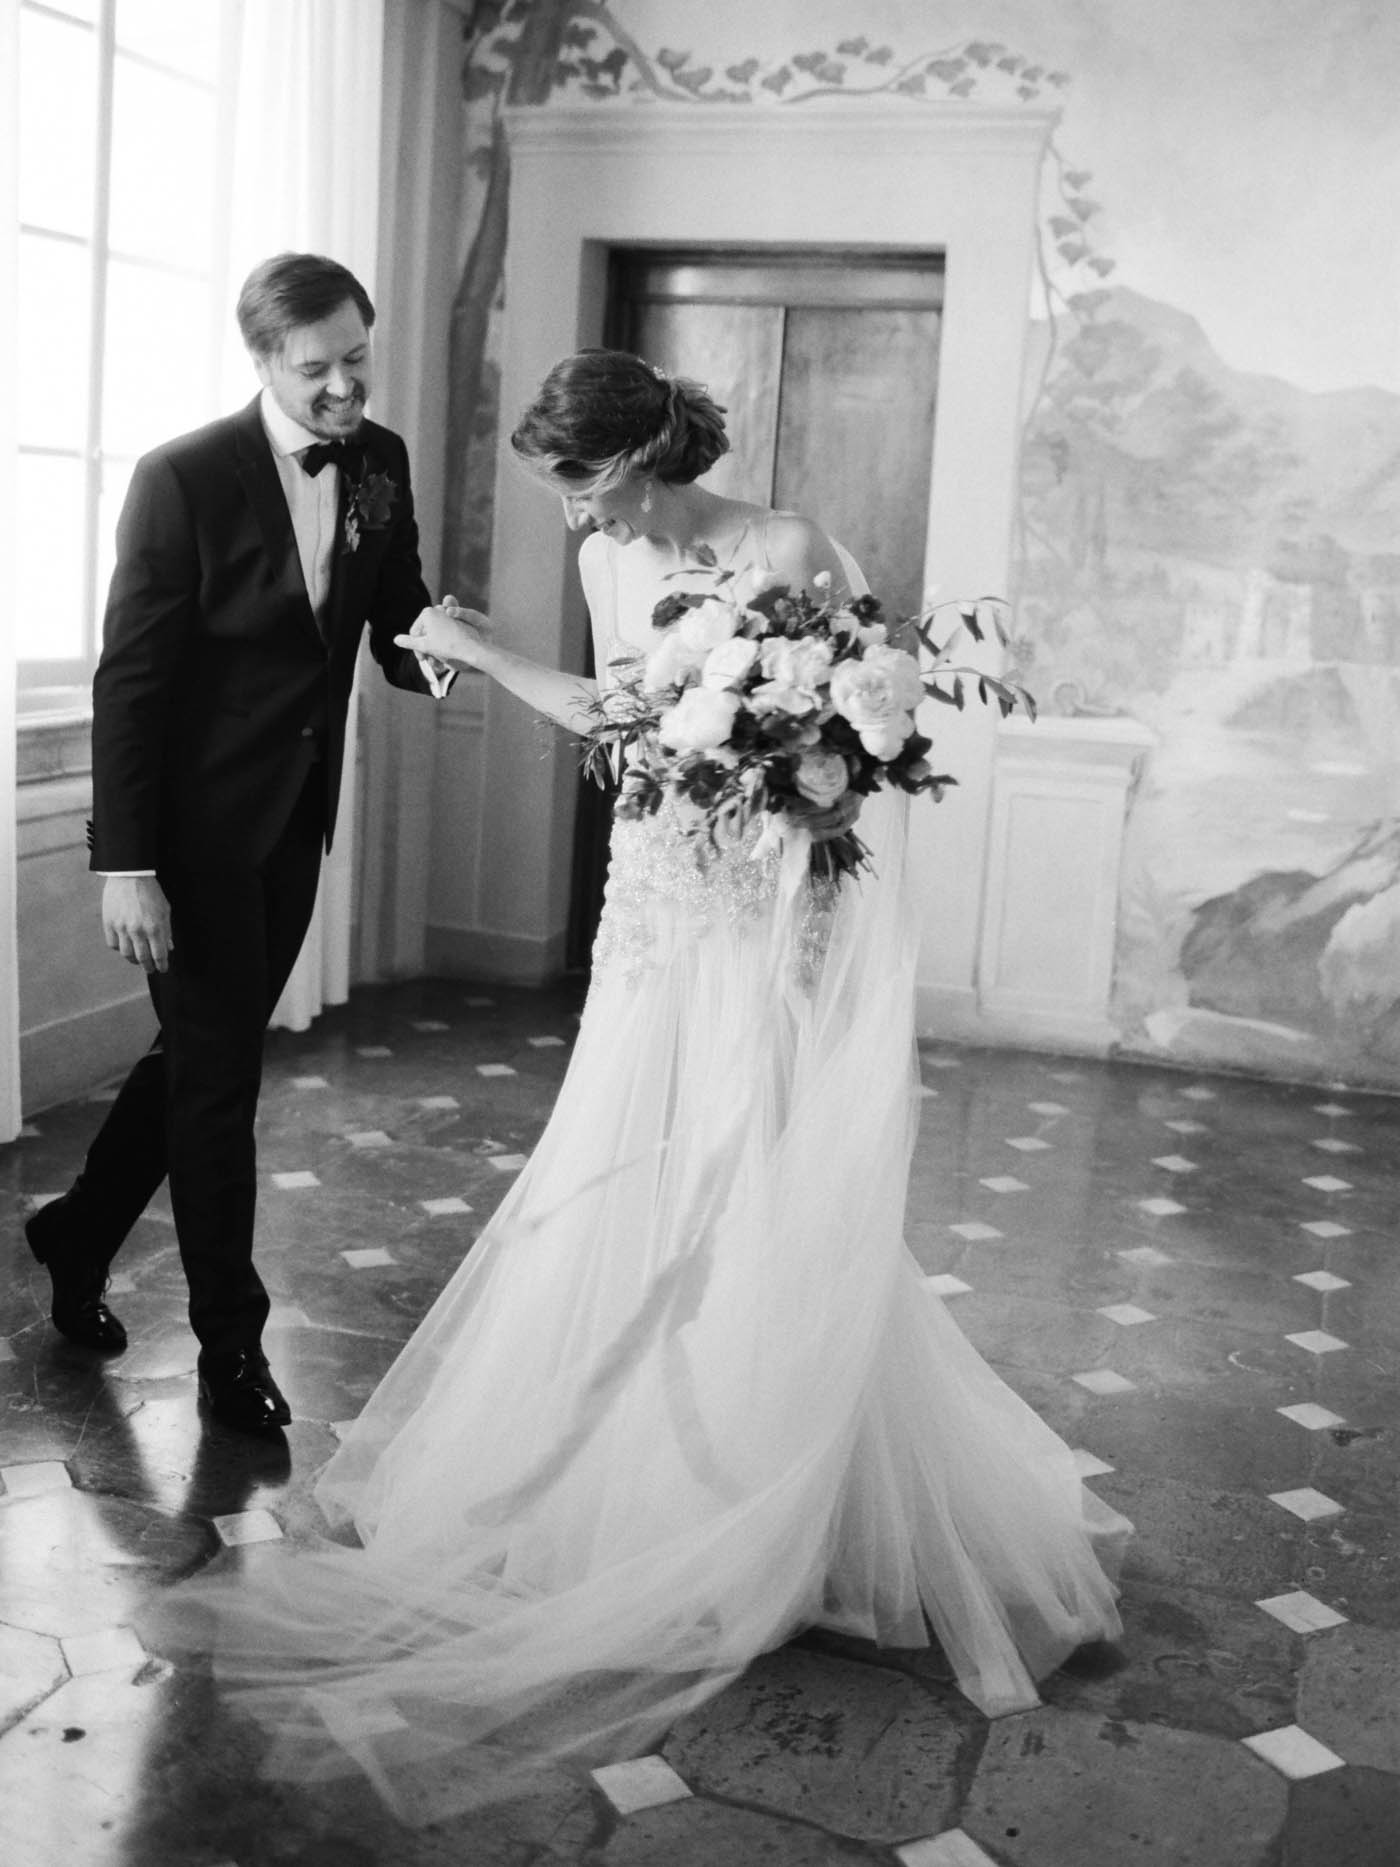 Villa_Cetinale_Wedding-20-Jen_Huang-ElanJacob-178-Jen_Huang-000058490026.jpg